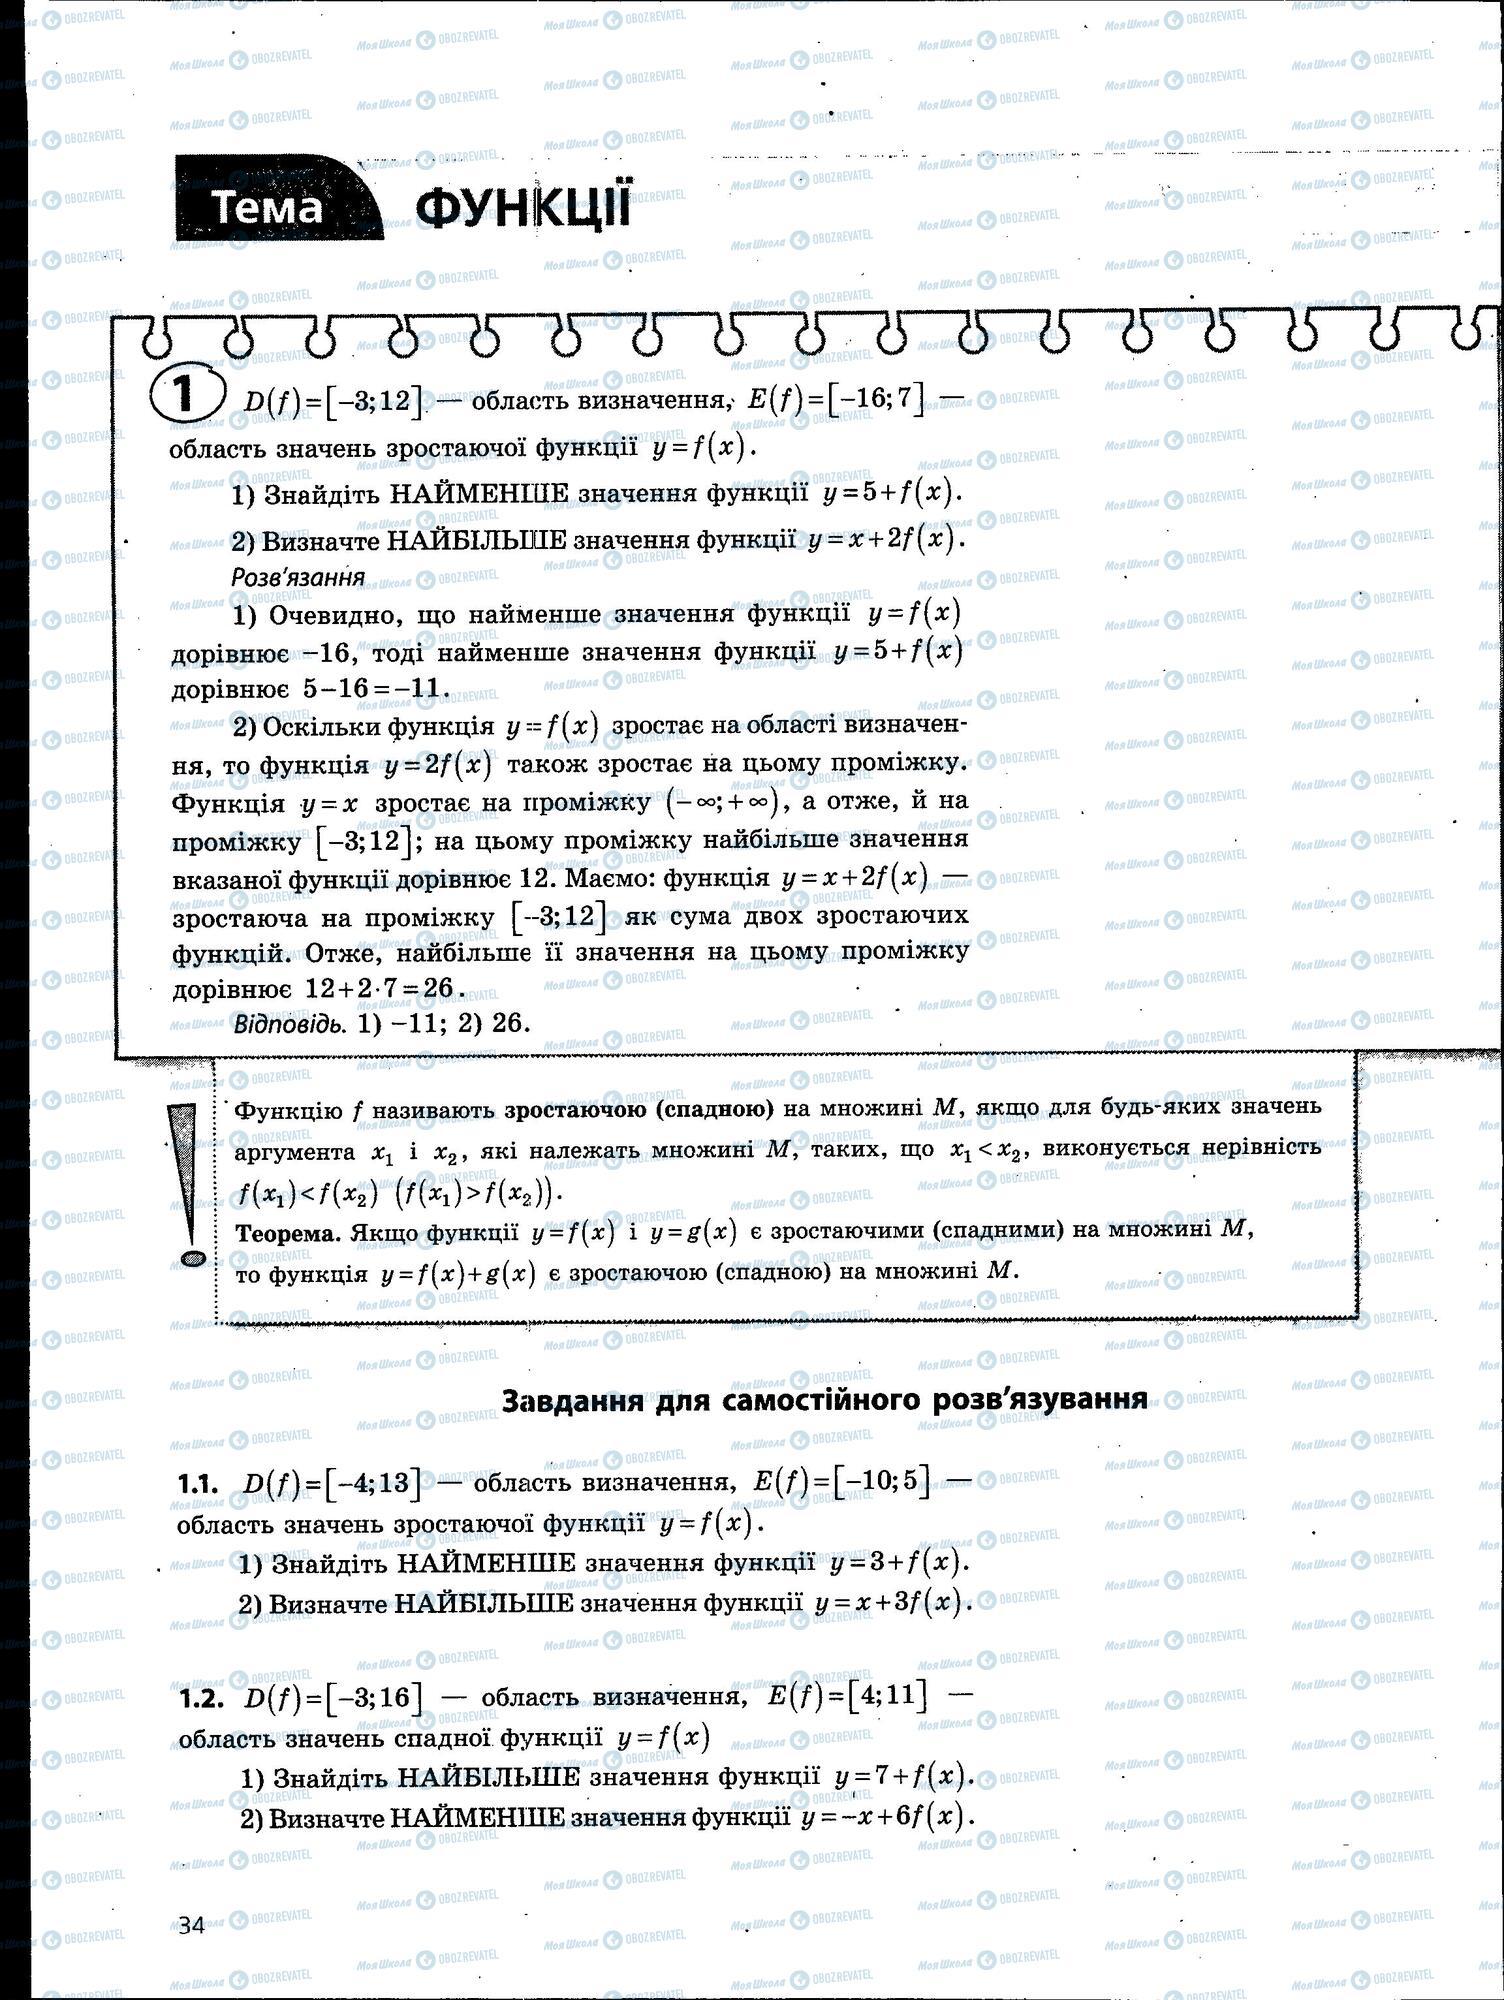 ЗНО Математика 11 класс страница 34